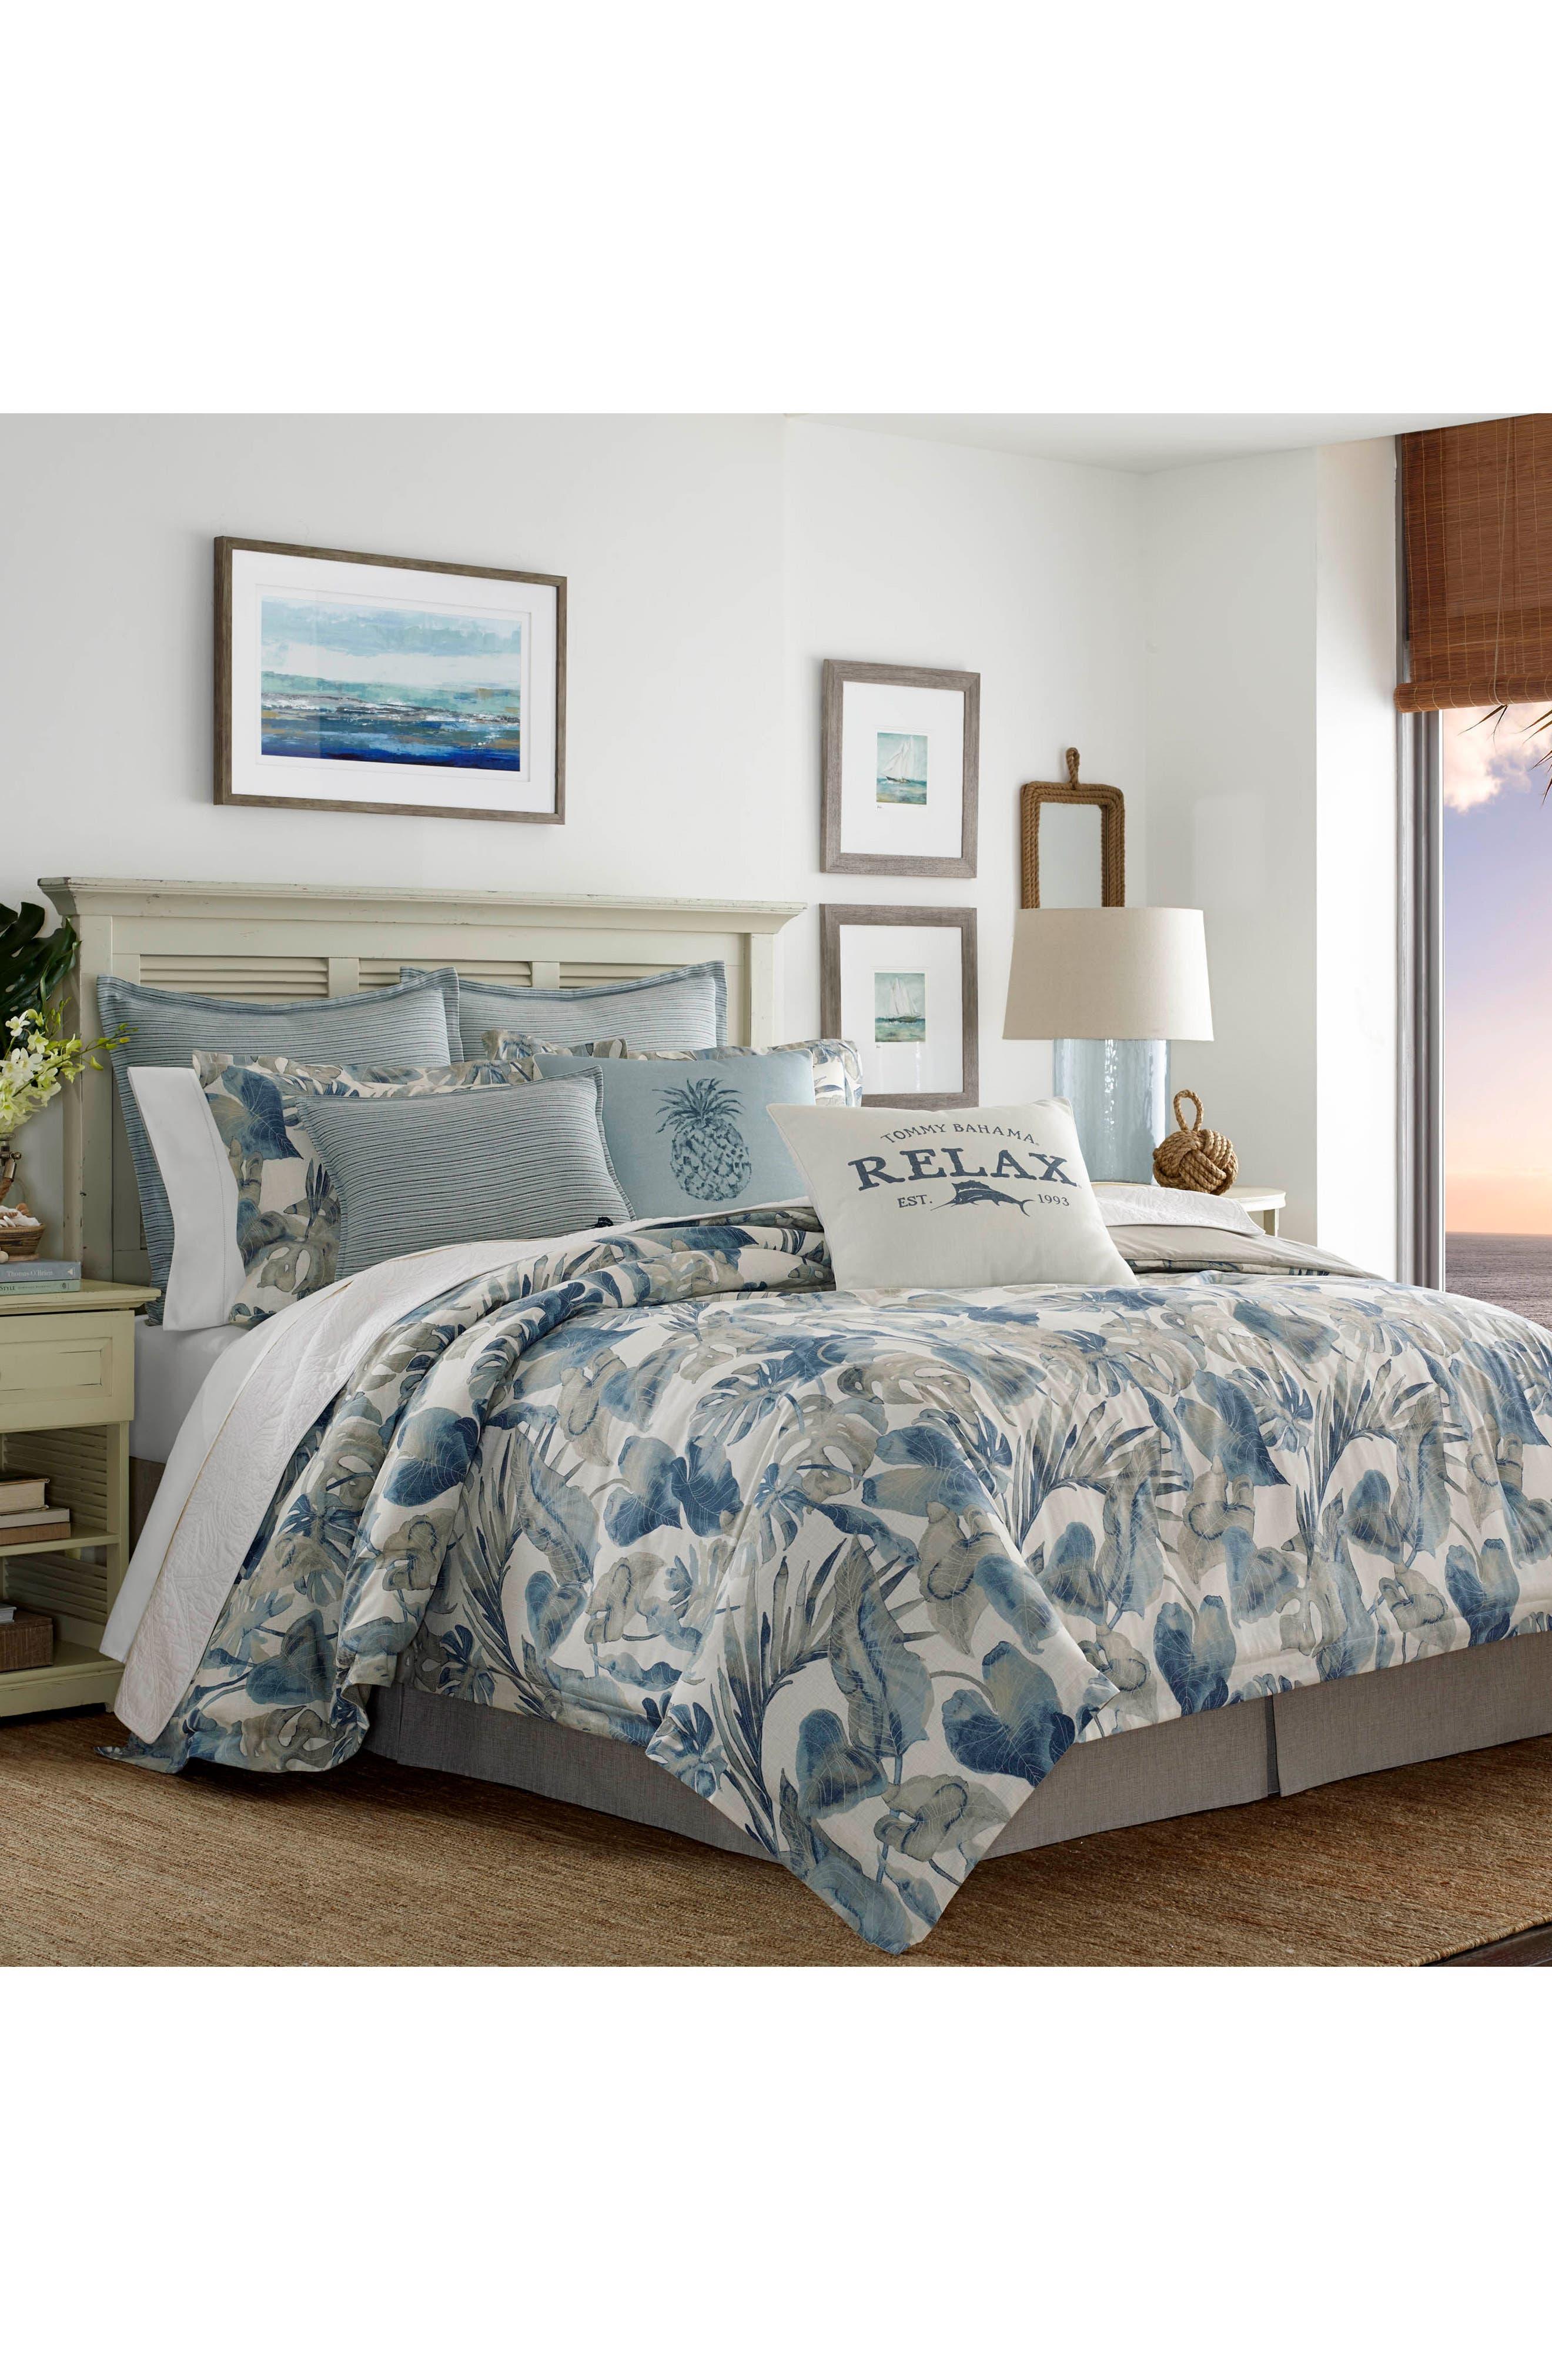 TOMMY BAHAMA Raw Coast Comforter, Sham & Bed Skirt Set, Main, color, 400